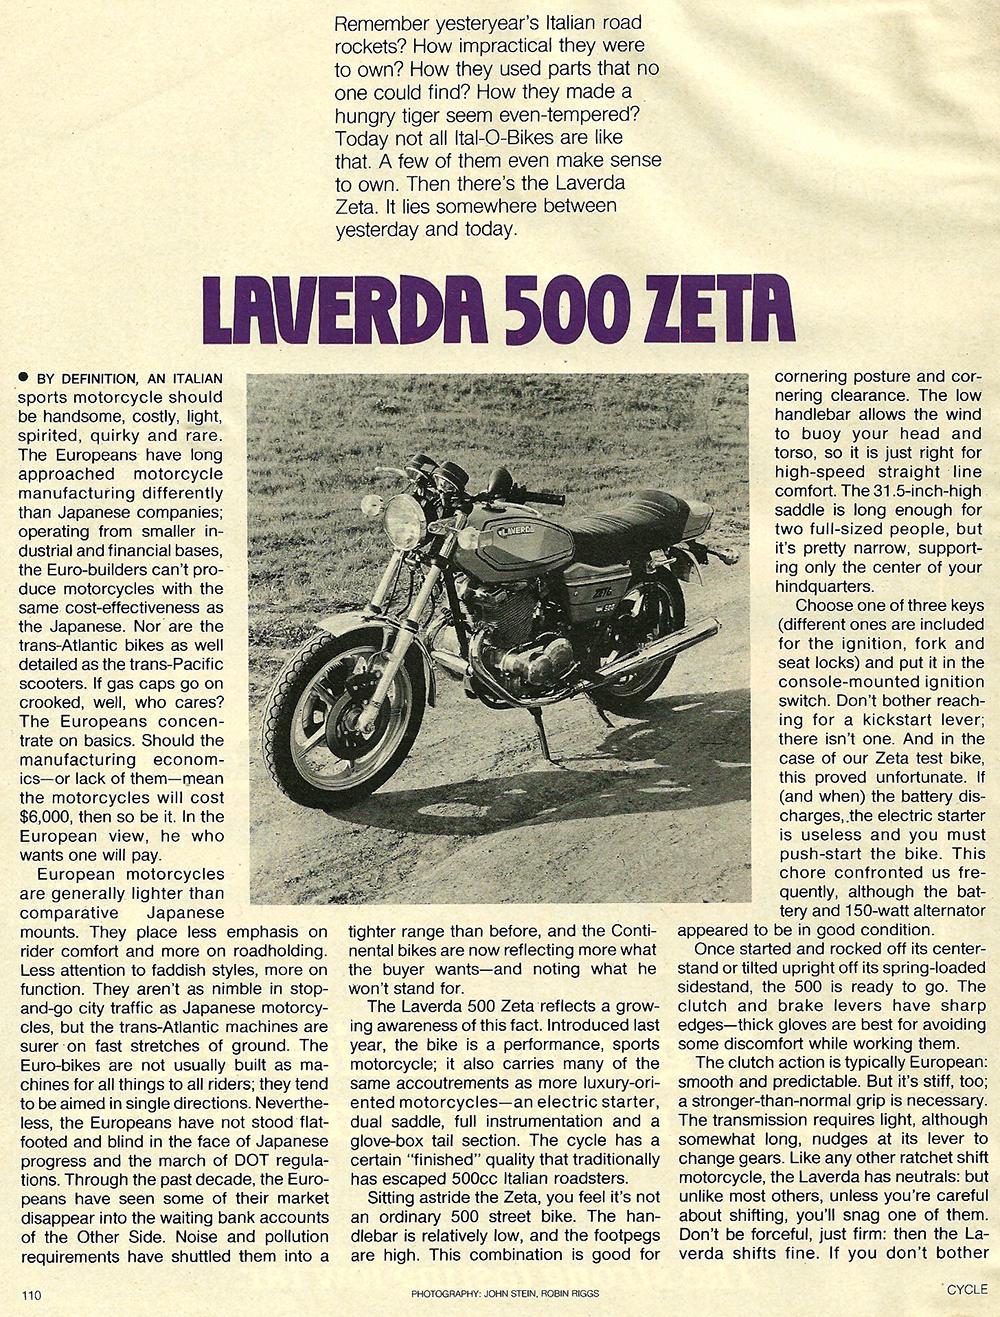 1979 Laverda 500 Zeta road test 1.jpg